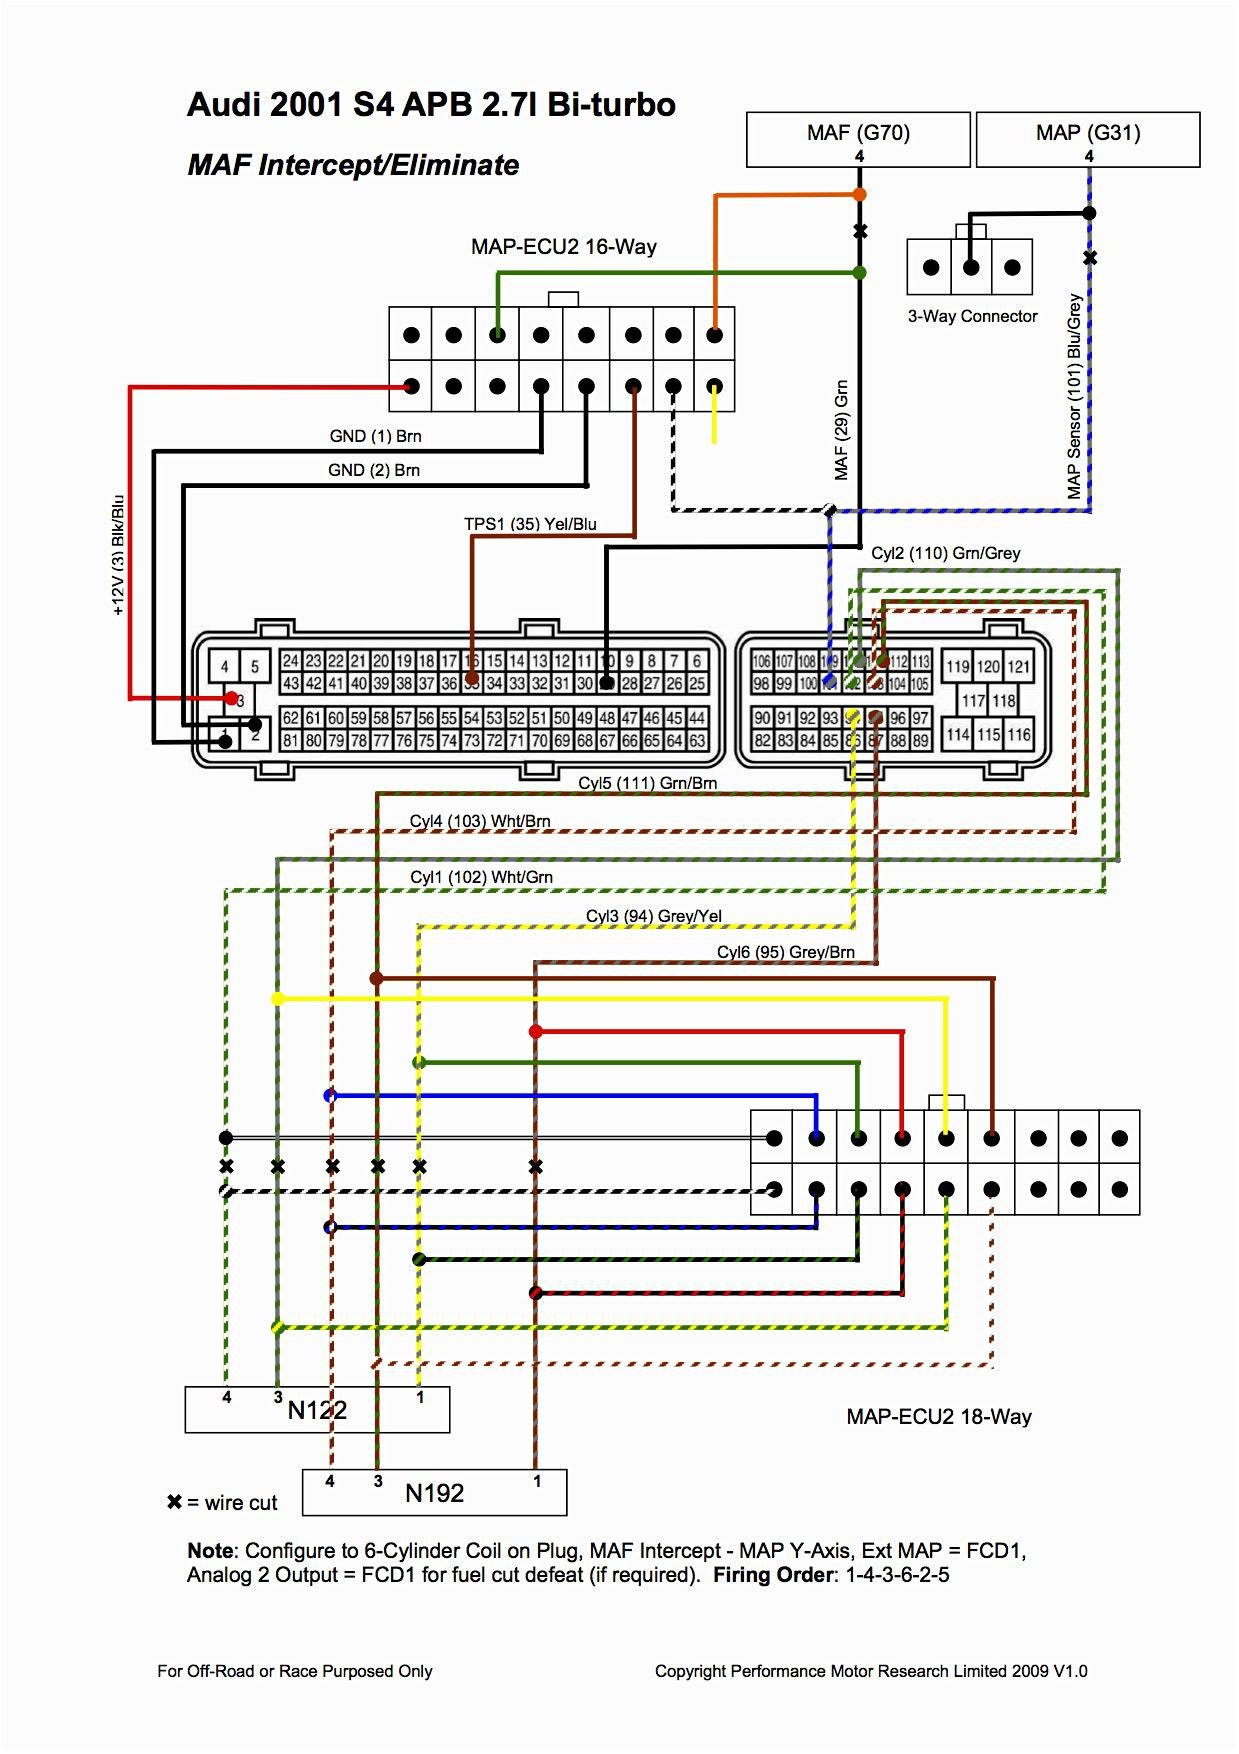 hight resolution of ouku car dvd wiring diagram diagram data schema exp ouku wiring harness ouku car stereo wiring